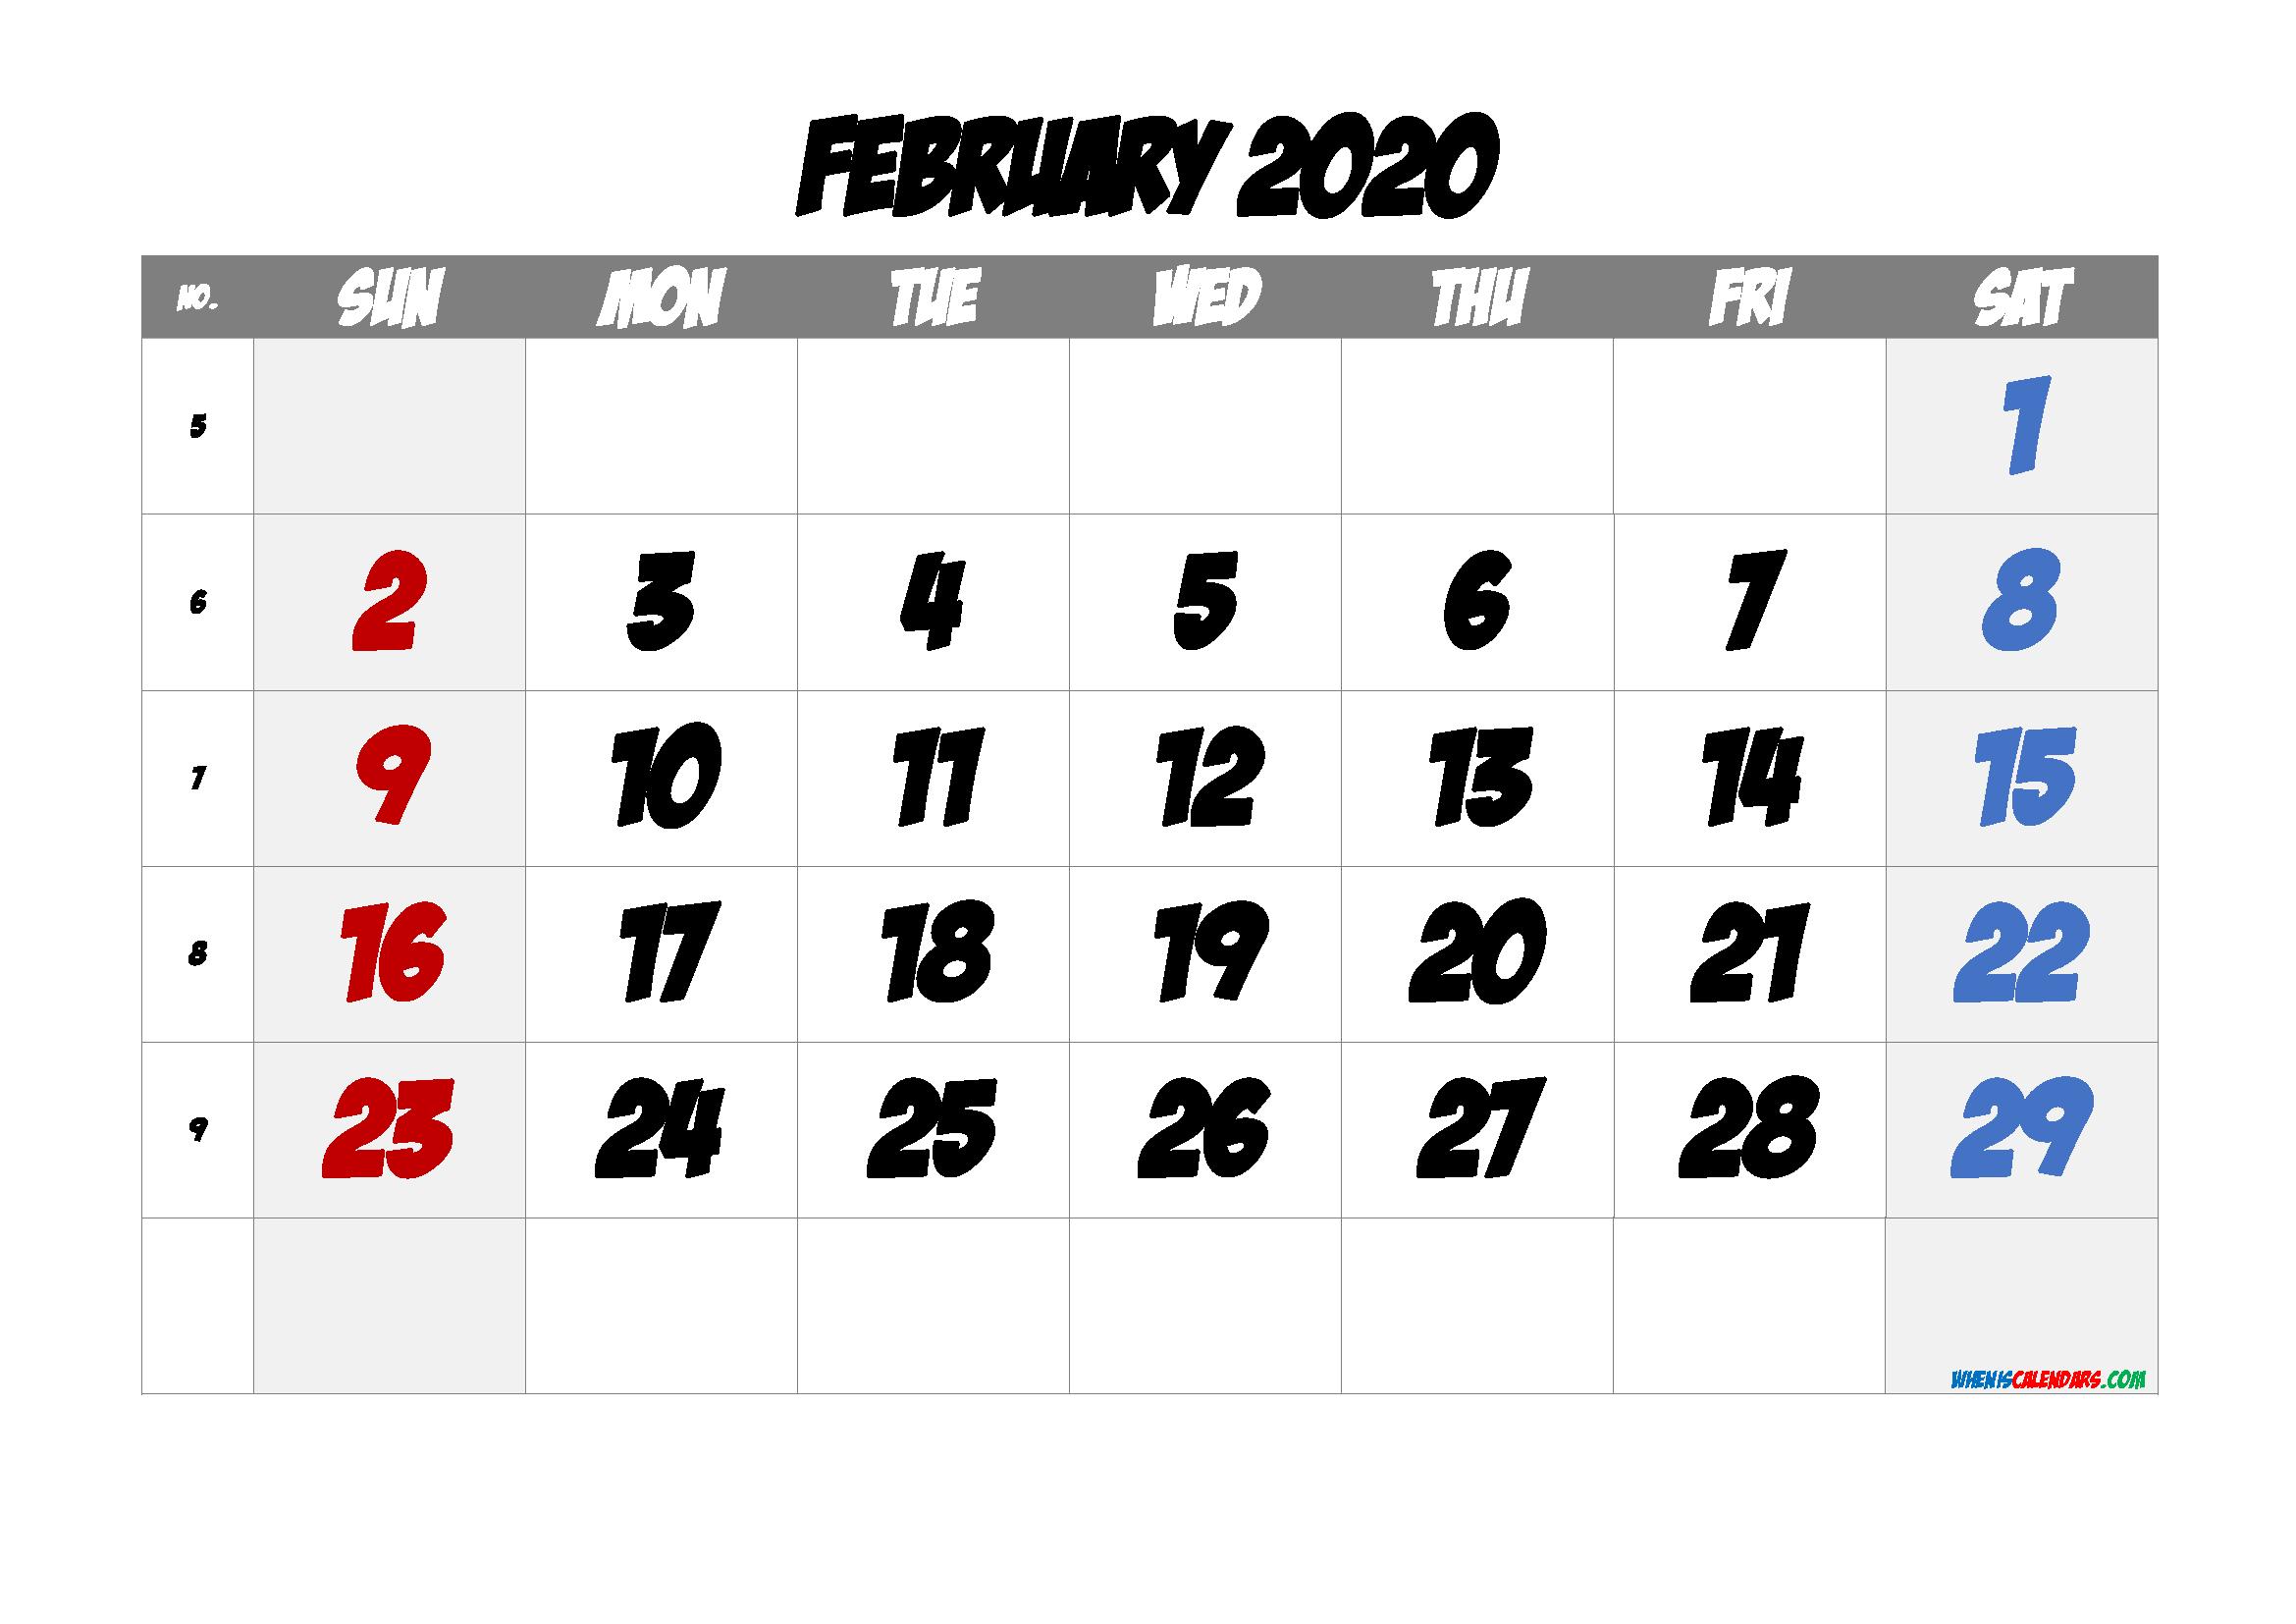 February 2020 Printable Calendar with Week Numbers